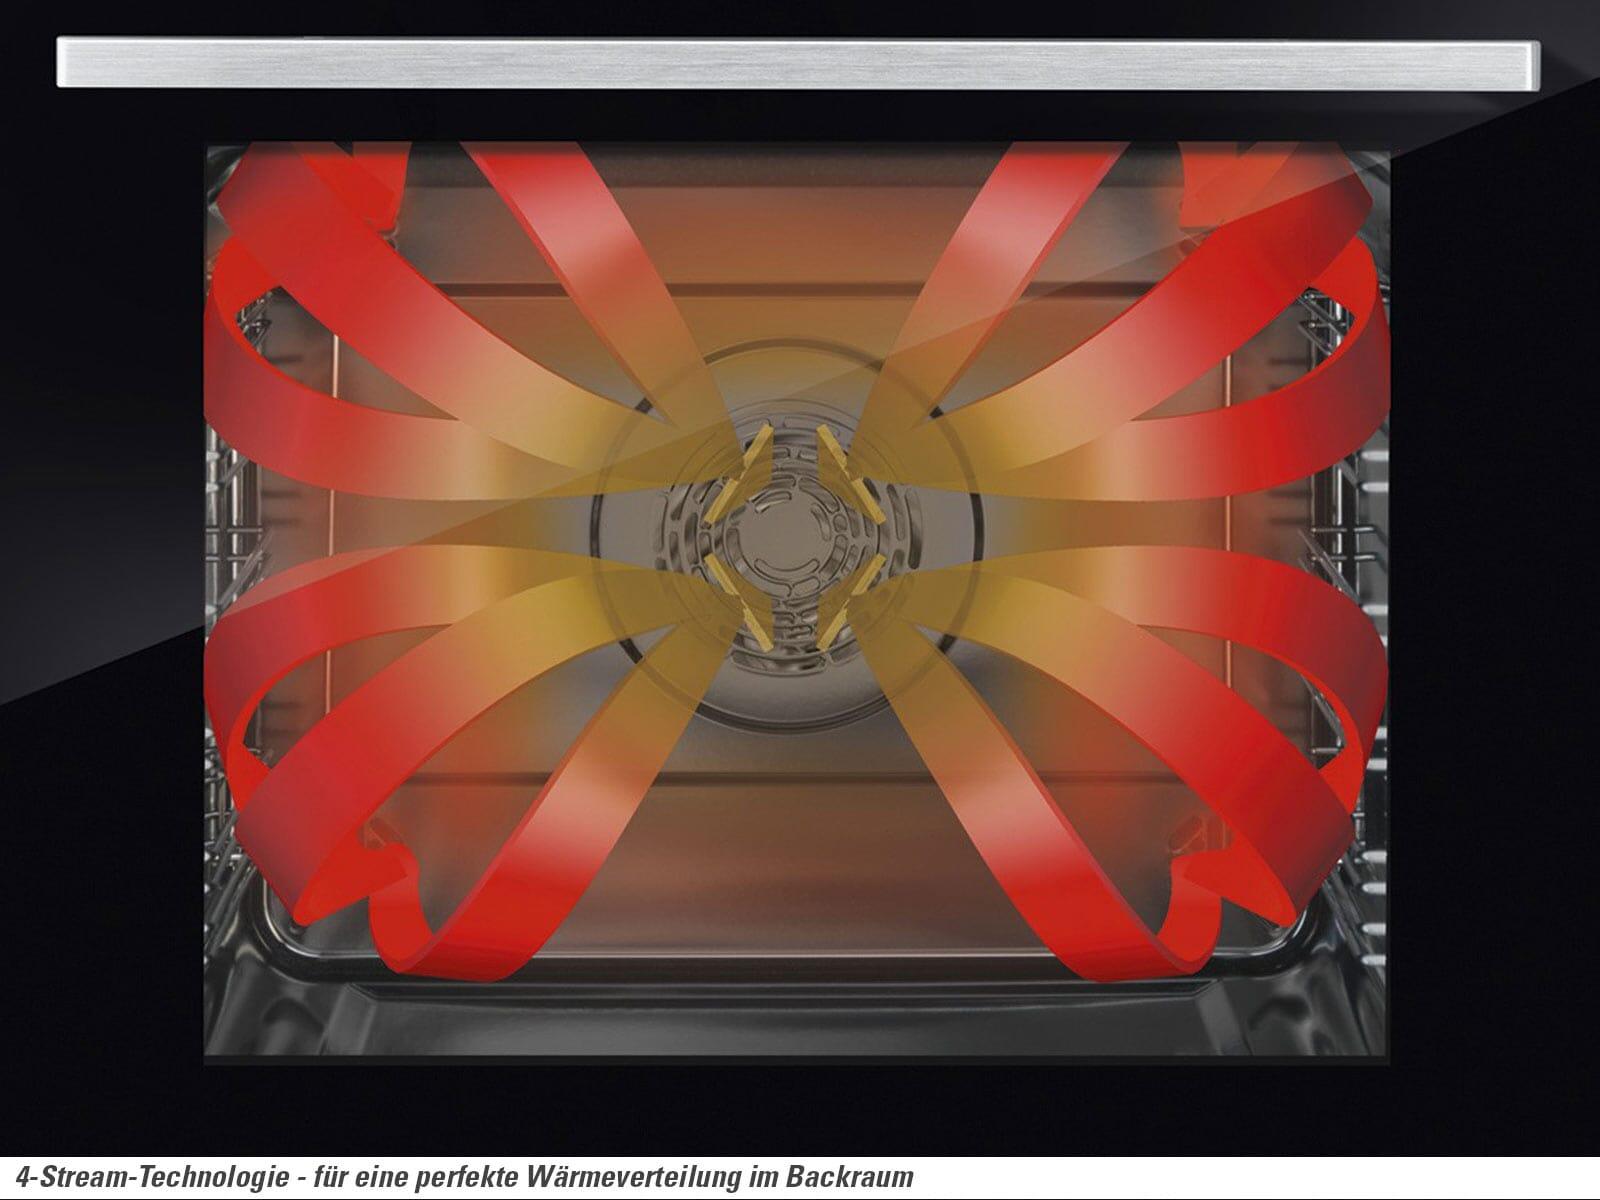 Oranier EBP 9884 12 - 9884 12 Pyrolyse Backofen Edelstahl/Schwarz